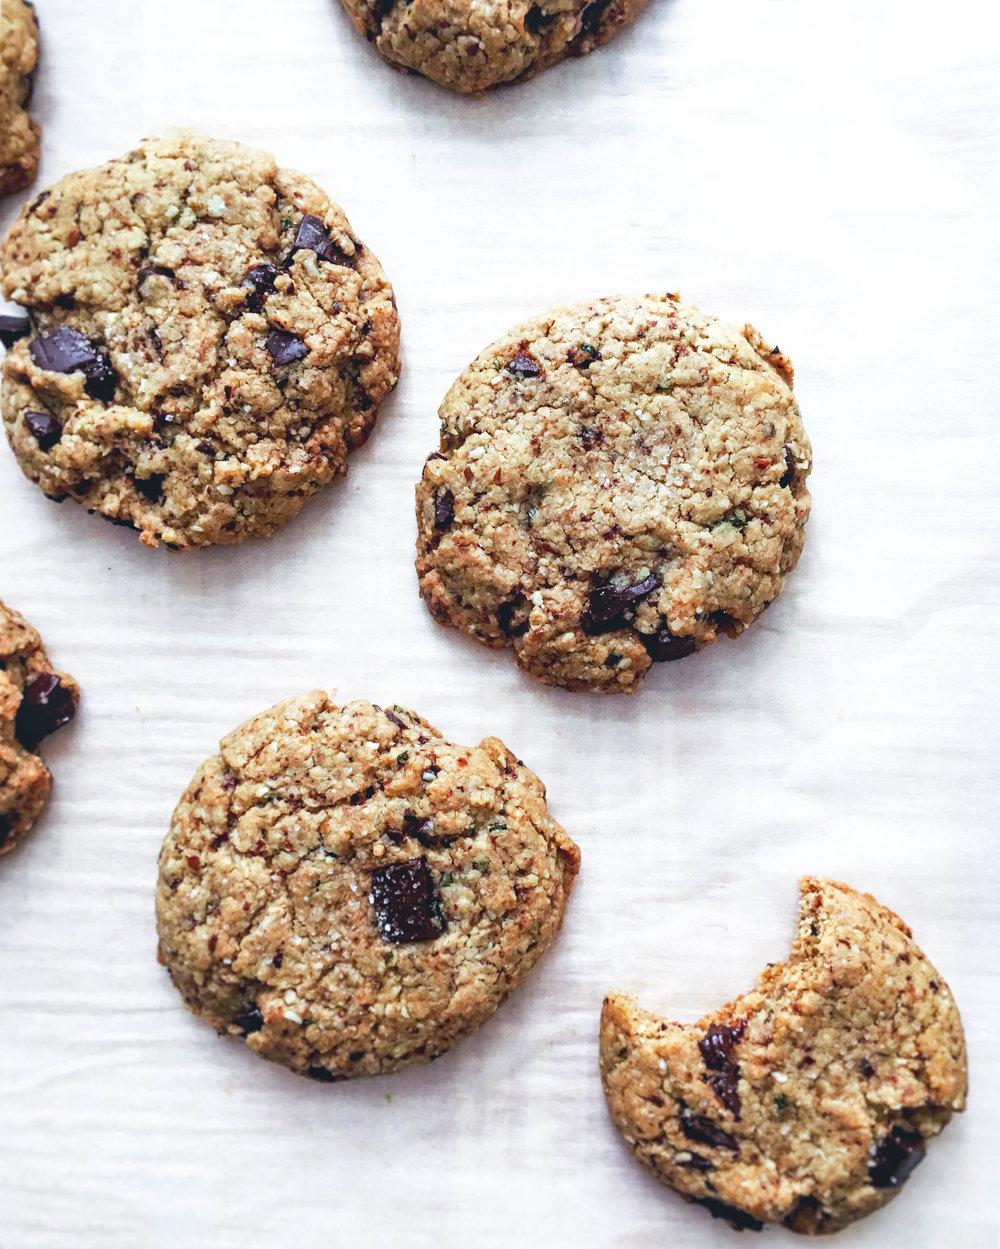 tahini-olive-oil-chocolate-chunk-cookies-vegan-gluten-free.jpg